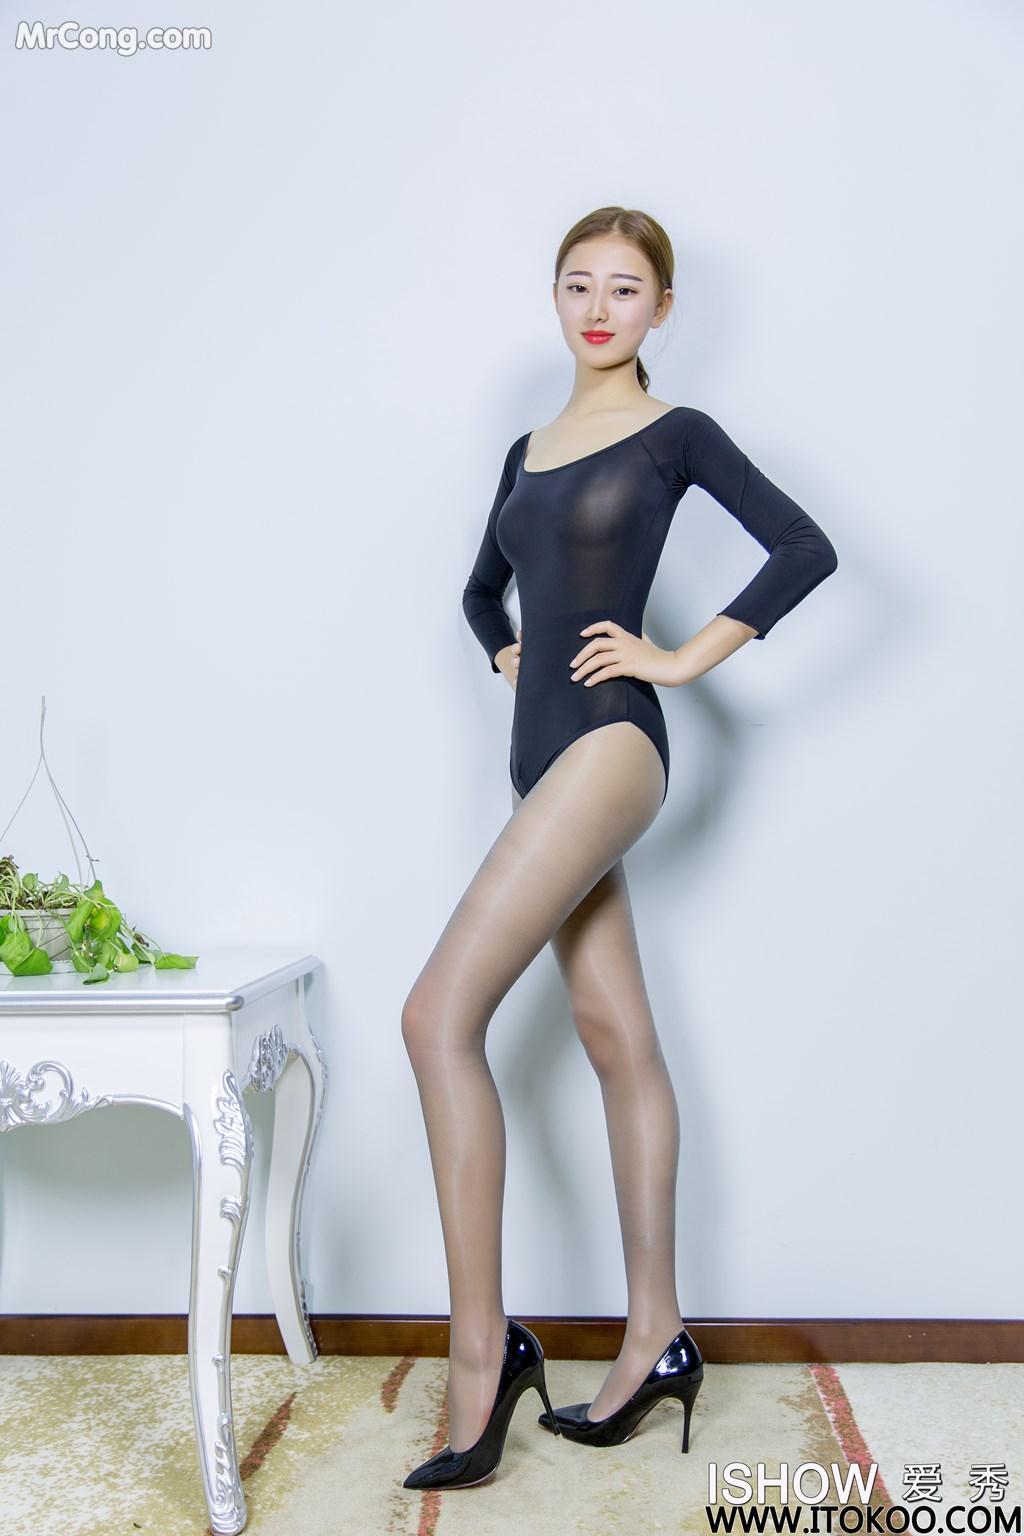 Image ISHOW-No.151-Han-Zhi-Ying-Flora-MrCong.com-002 in post ISHOW No.151: Người mẫu Han Zhi Ying (寒栀樱Flora) (31 ảnh)